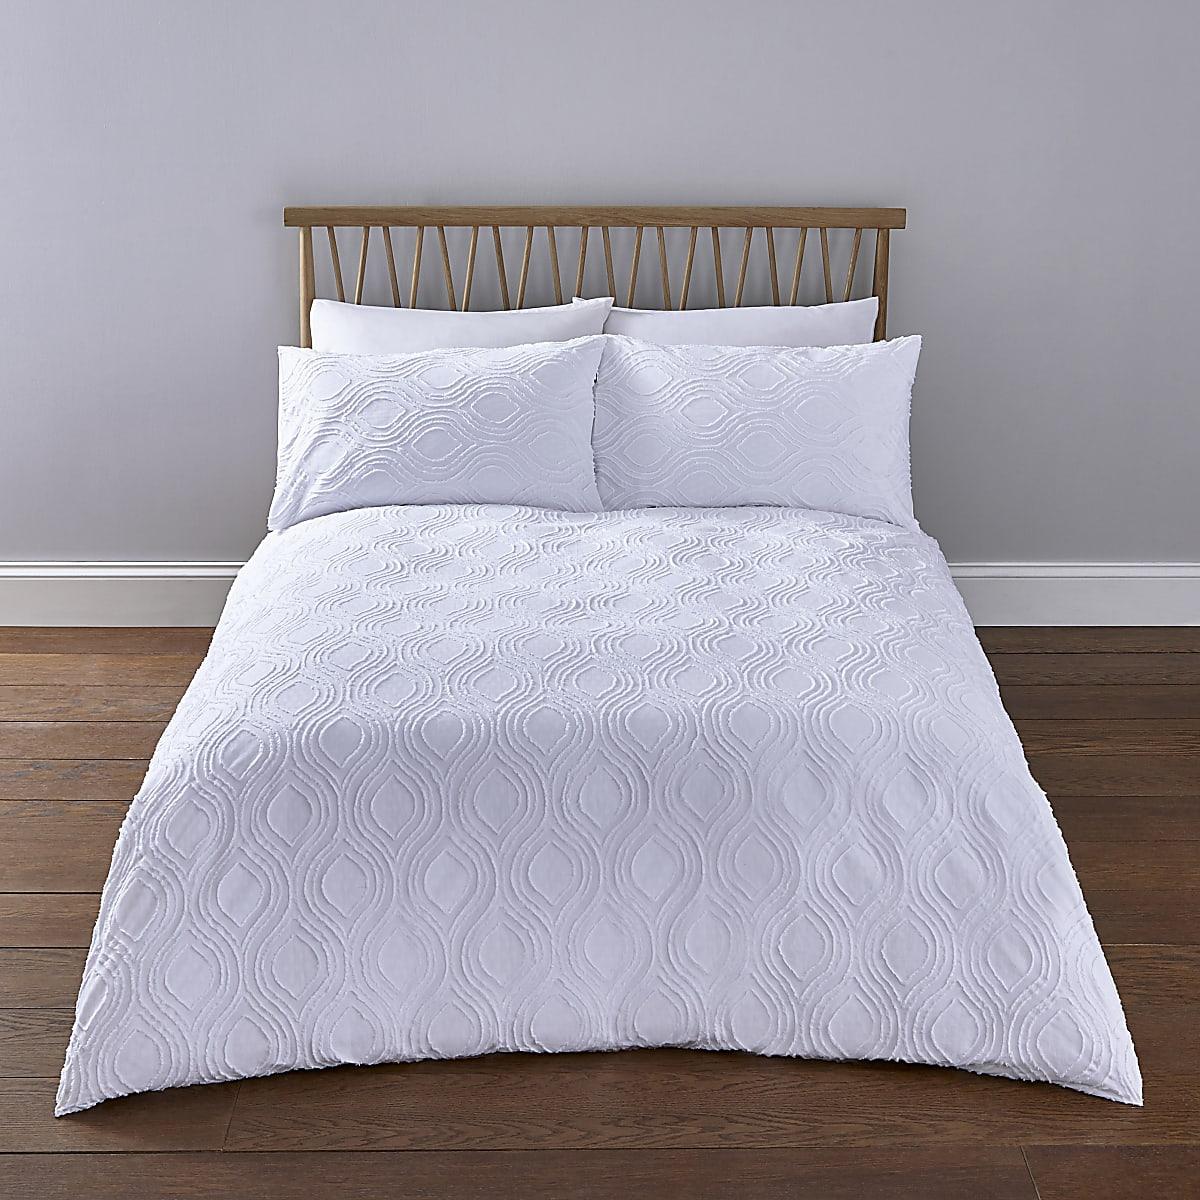 White geo textured double duvet bed set